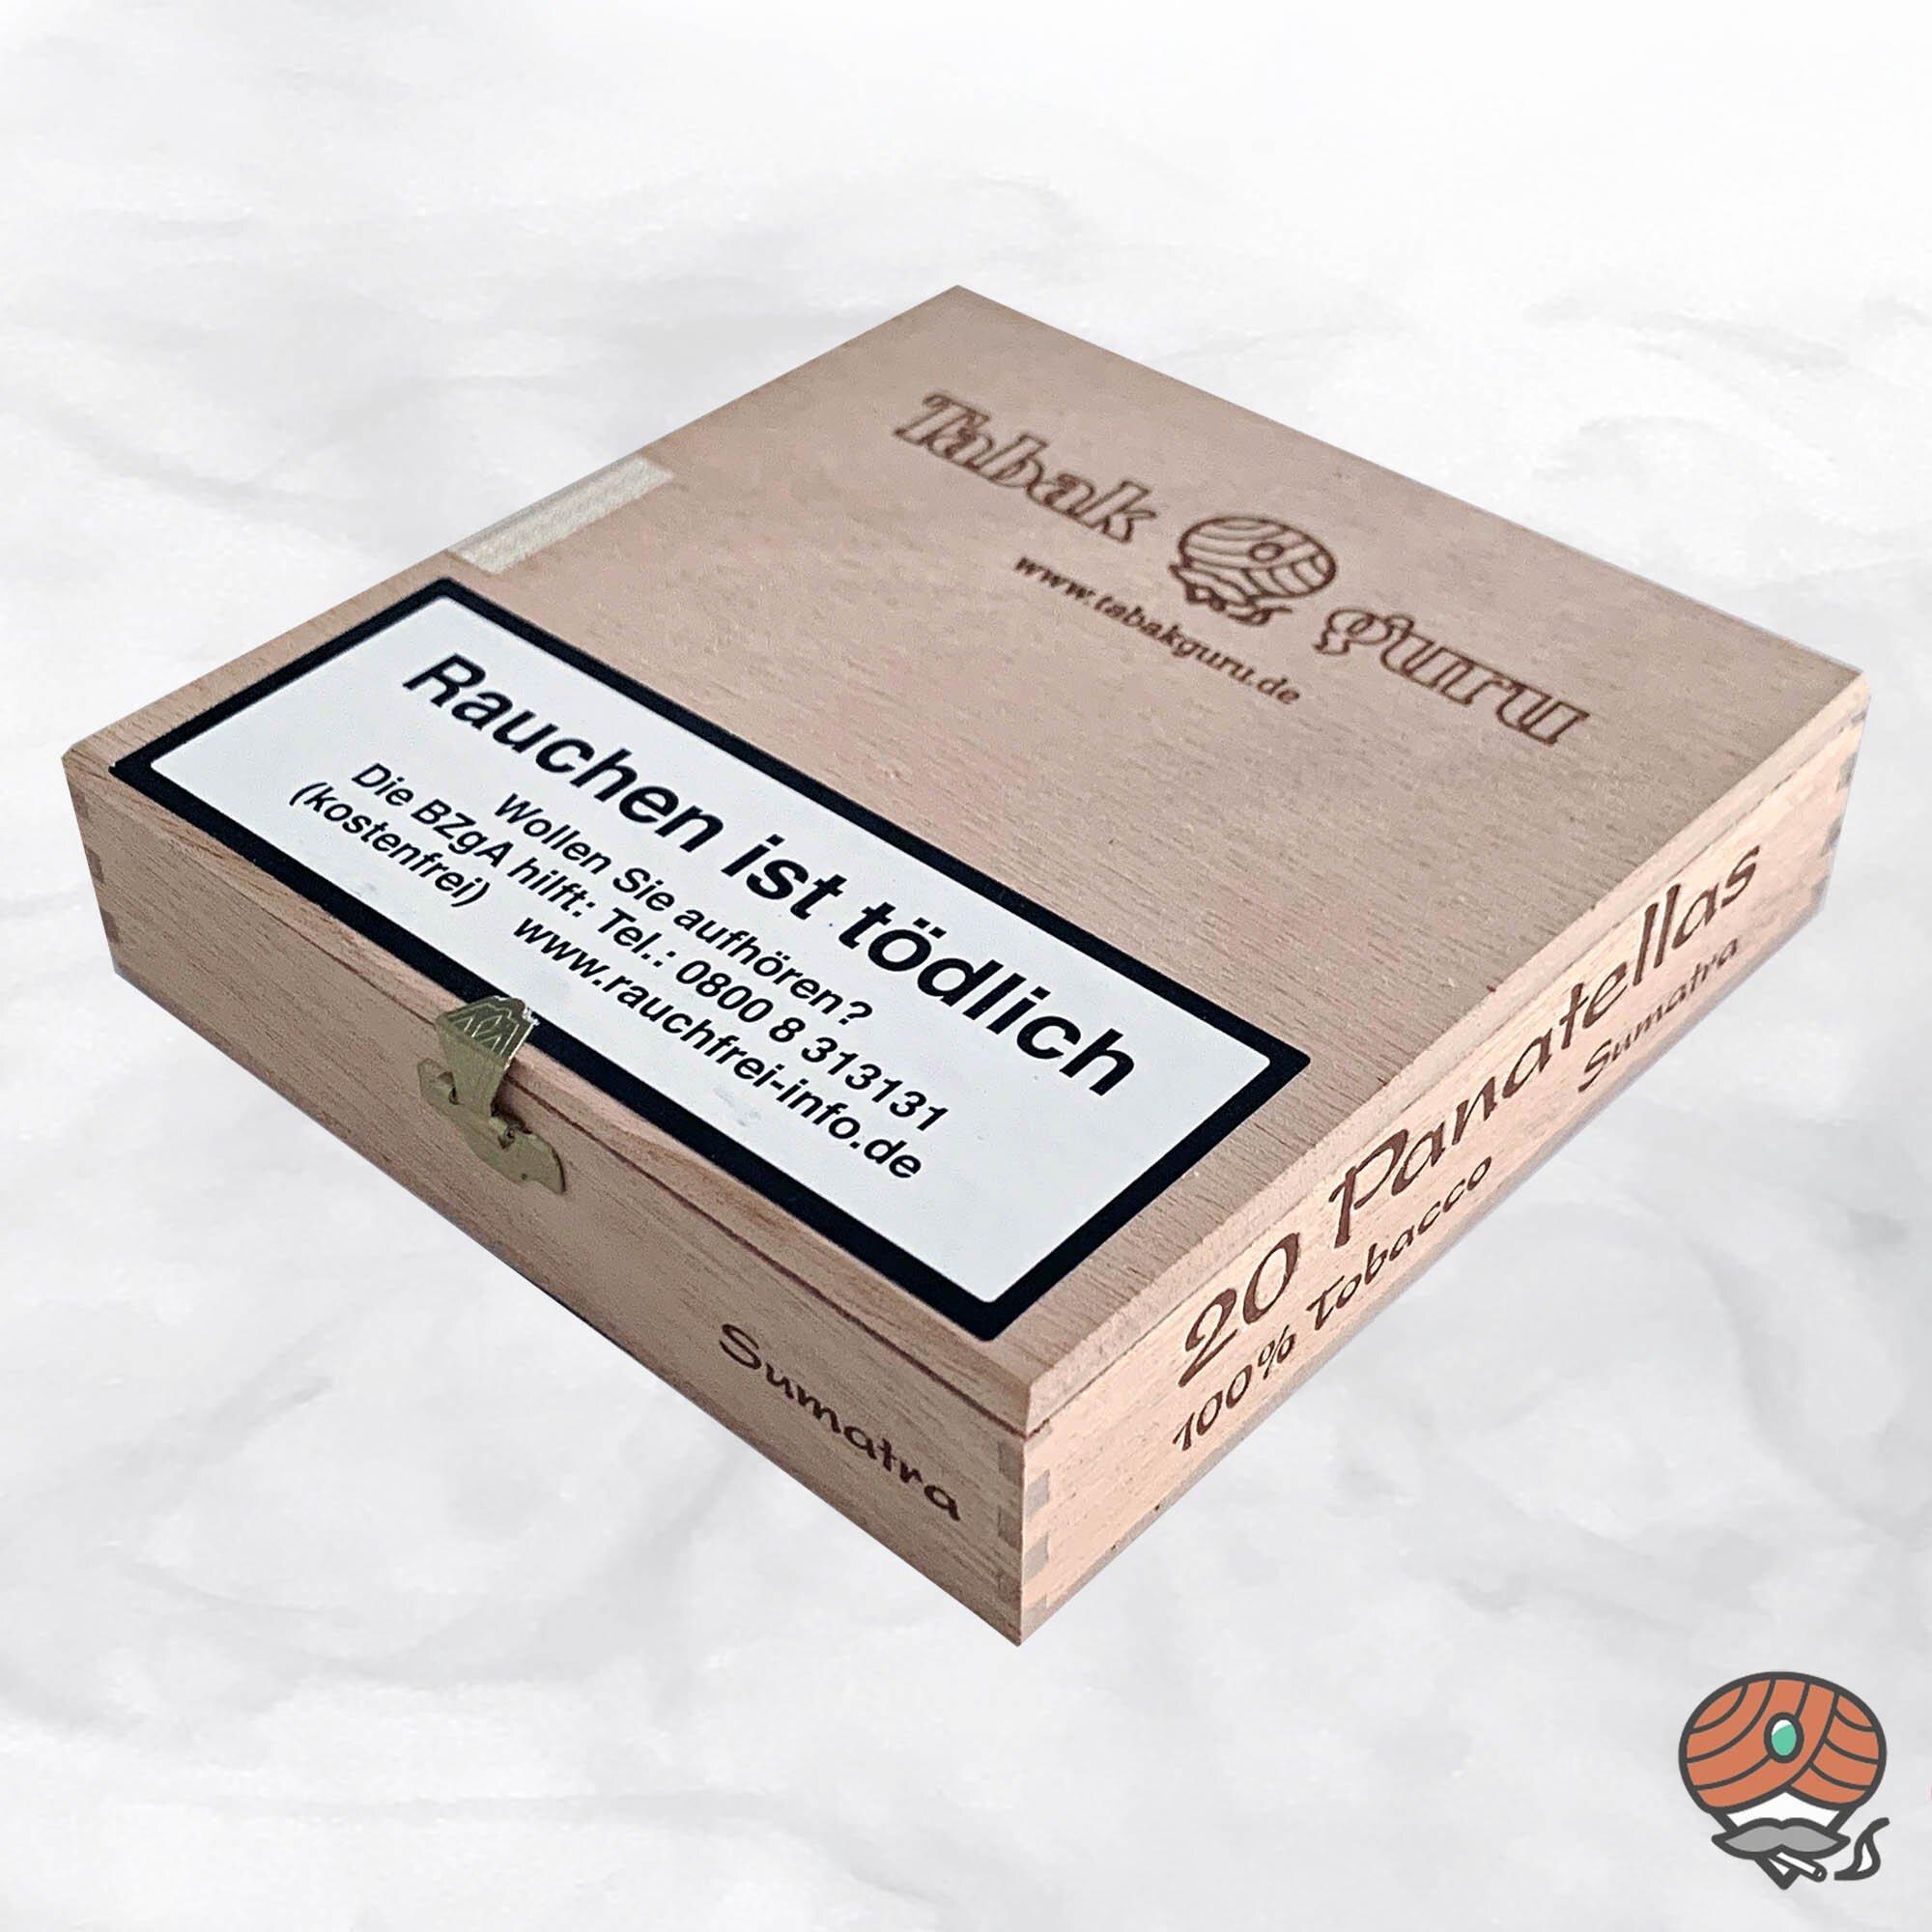 20 Tabakguru Panatellas Sumatra Zigarren 100 % Tabak